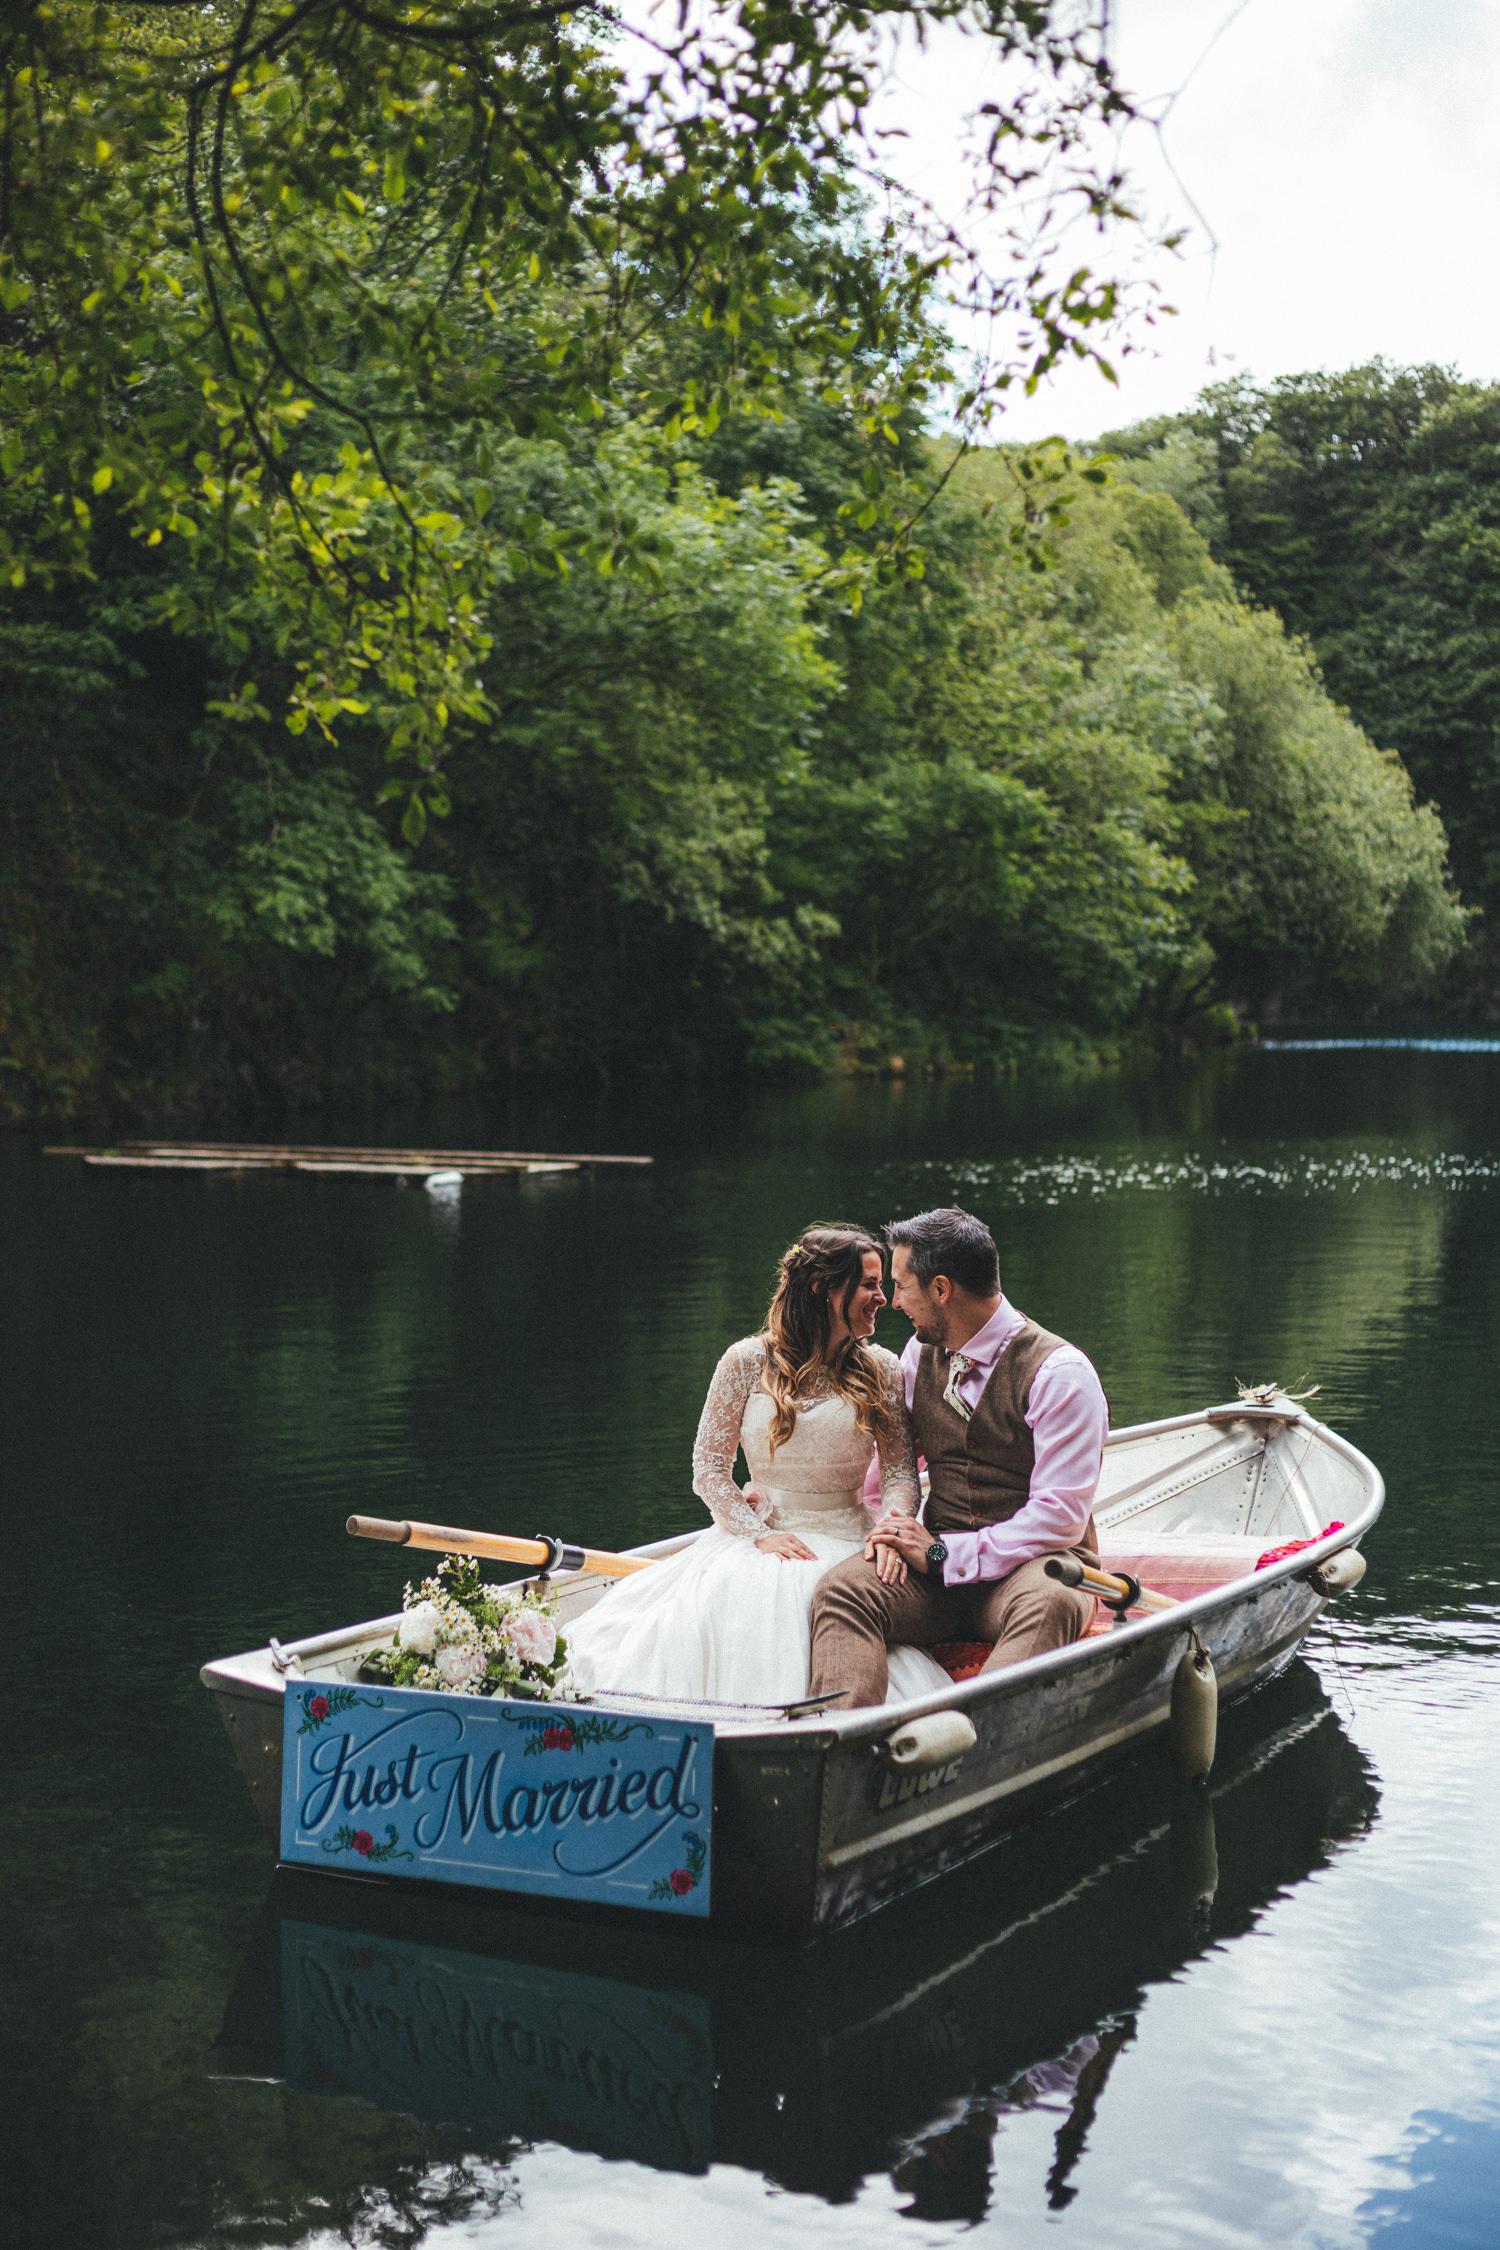 Cornish Tipi Wedding Photographer, Cornish Tipi Weddings, lake at Cornish Tipi Holidays, summer wedding, outdoor wedding, June wedding